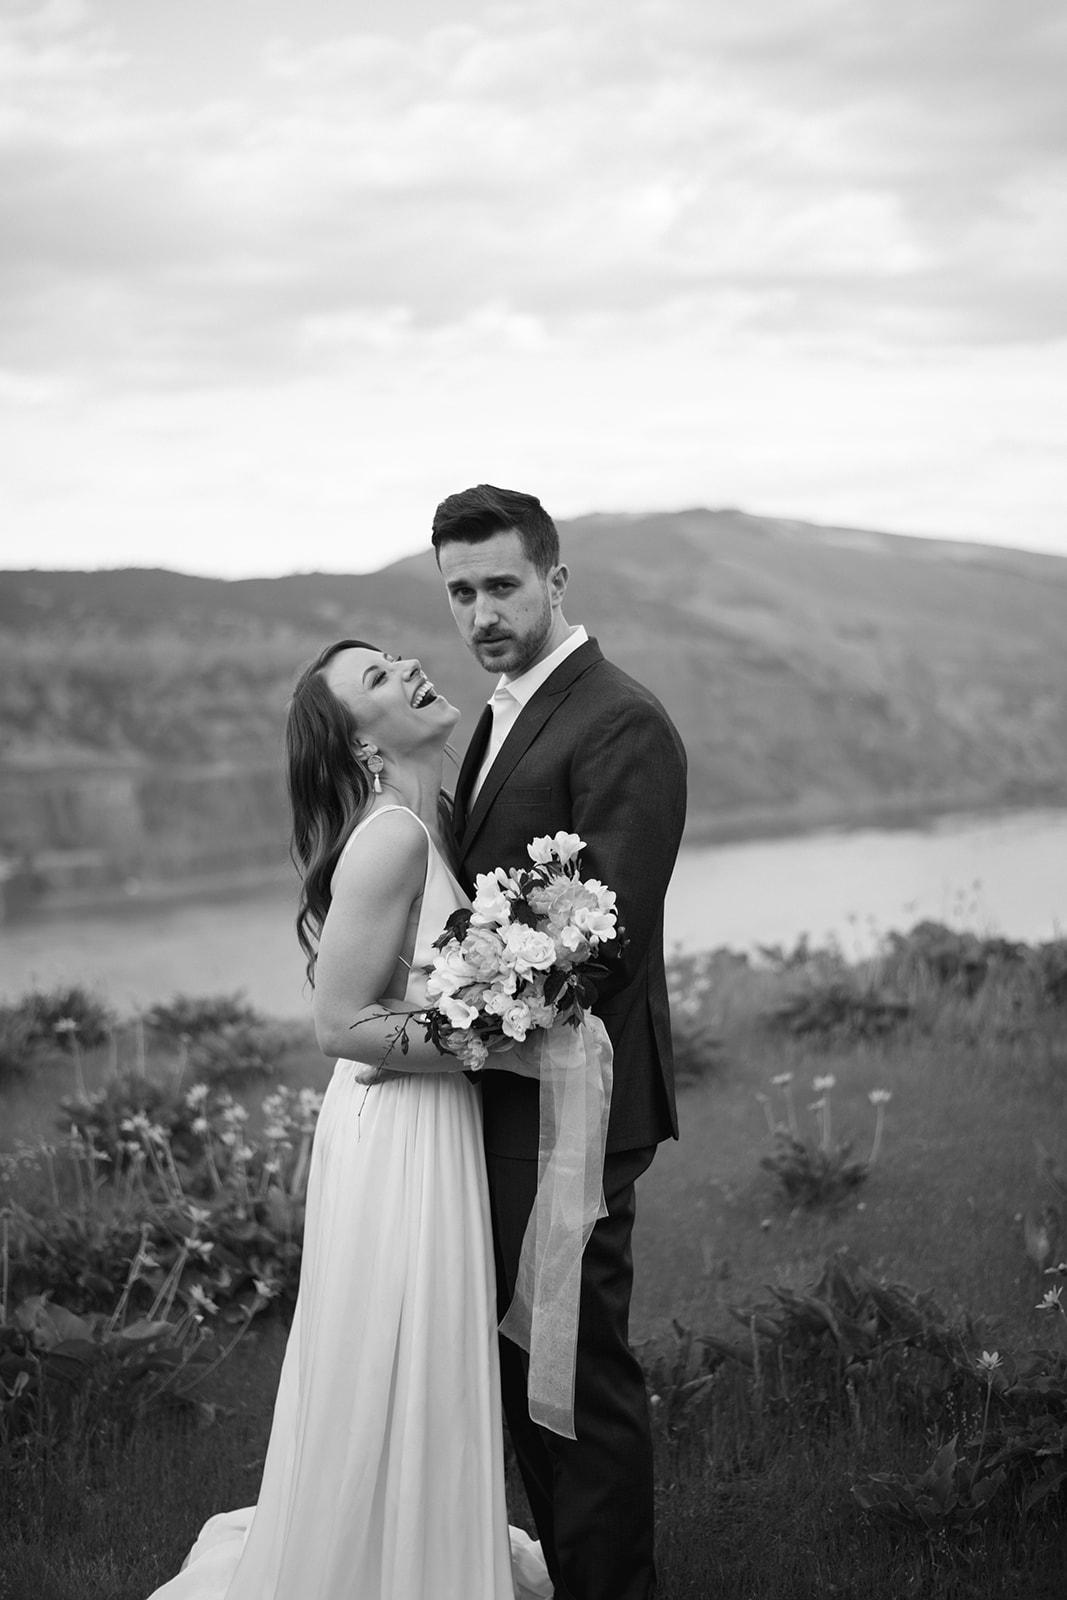 kamea_events_wedding_planner_portland_DeusAmor09.jpg